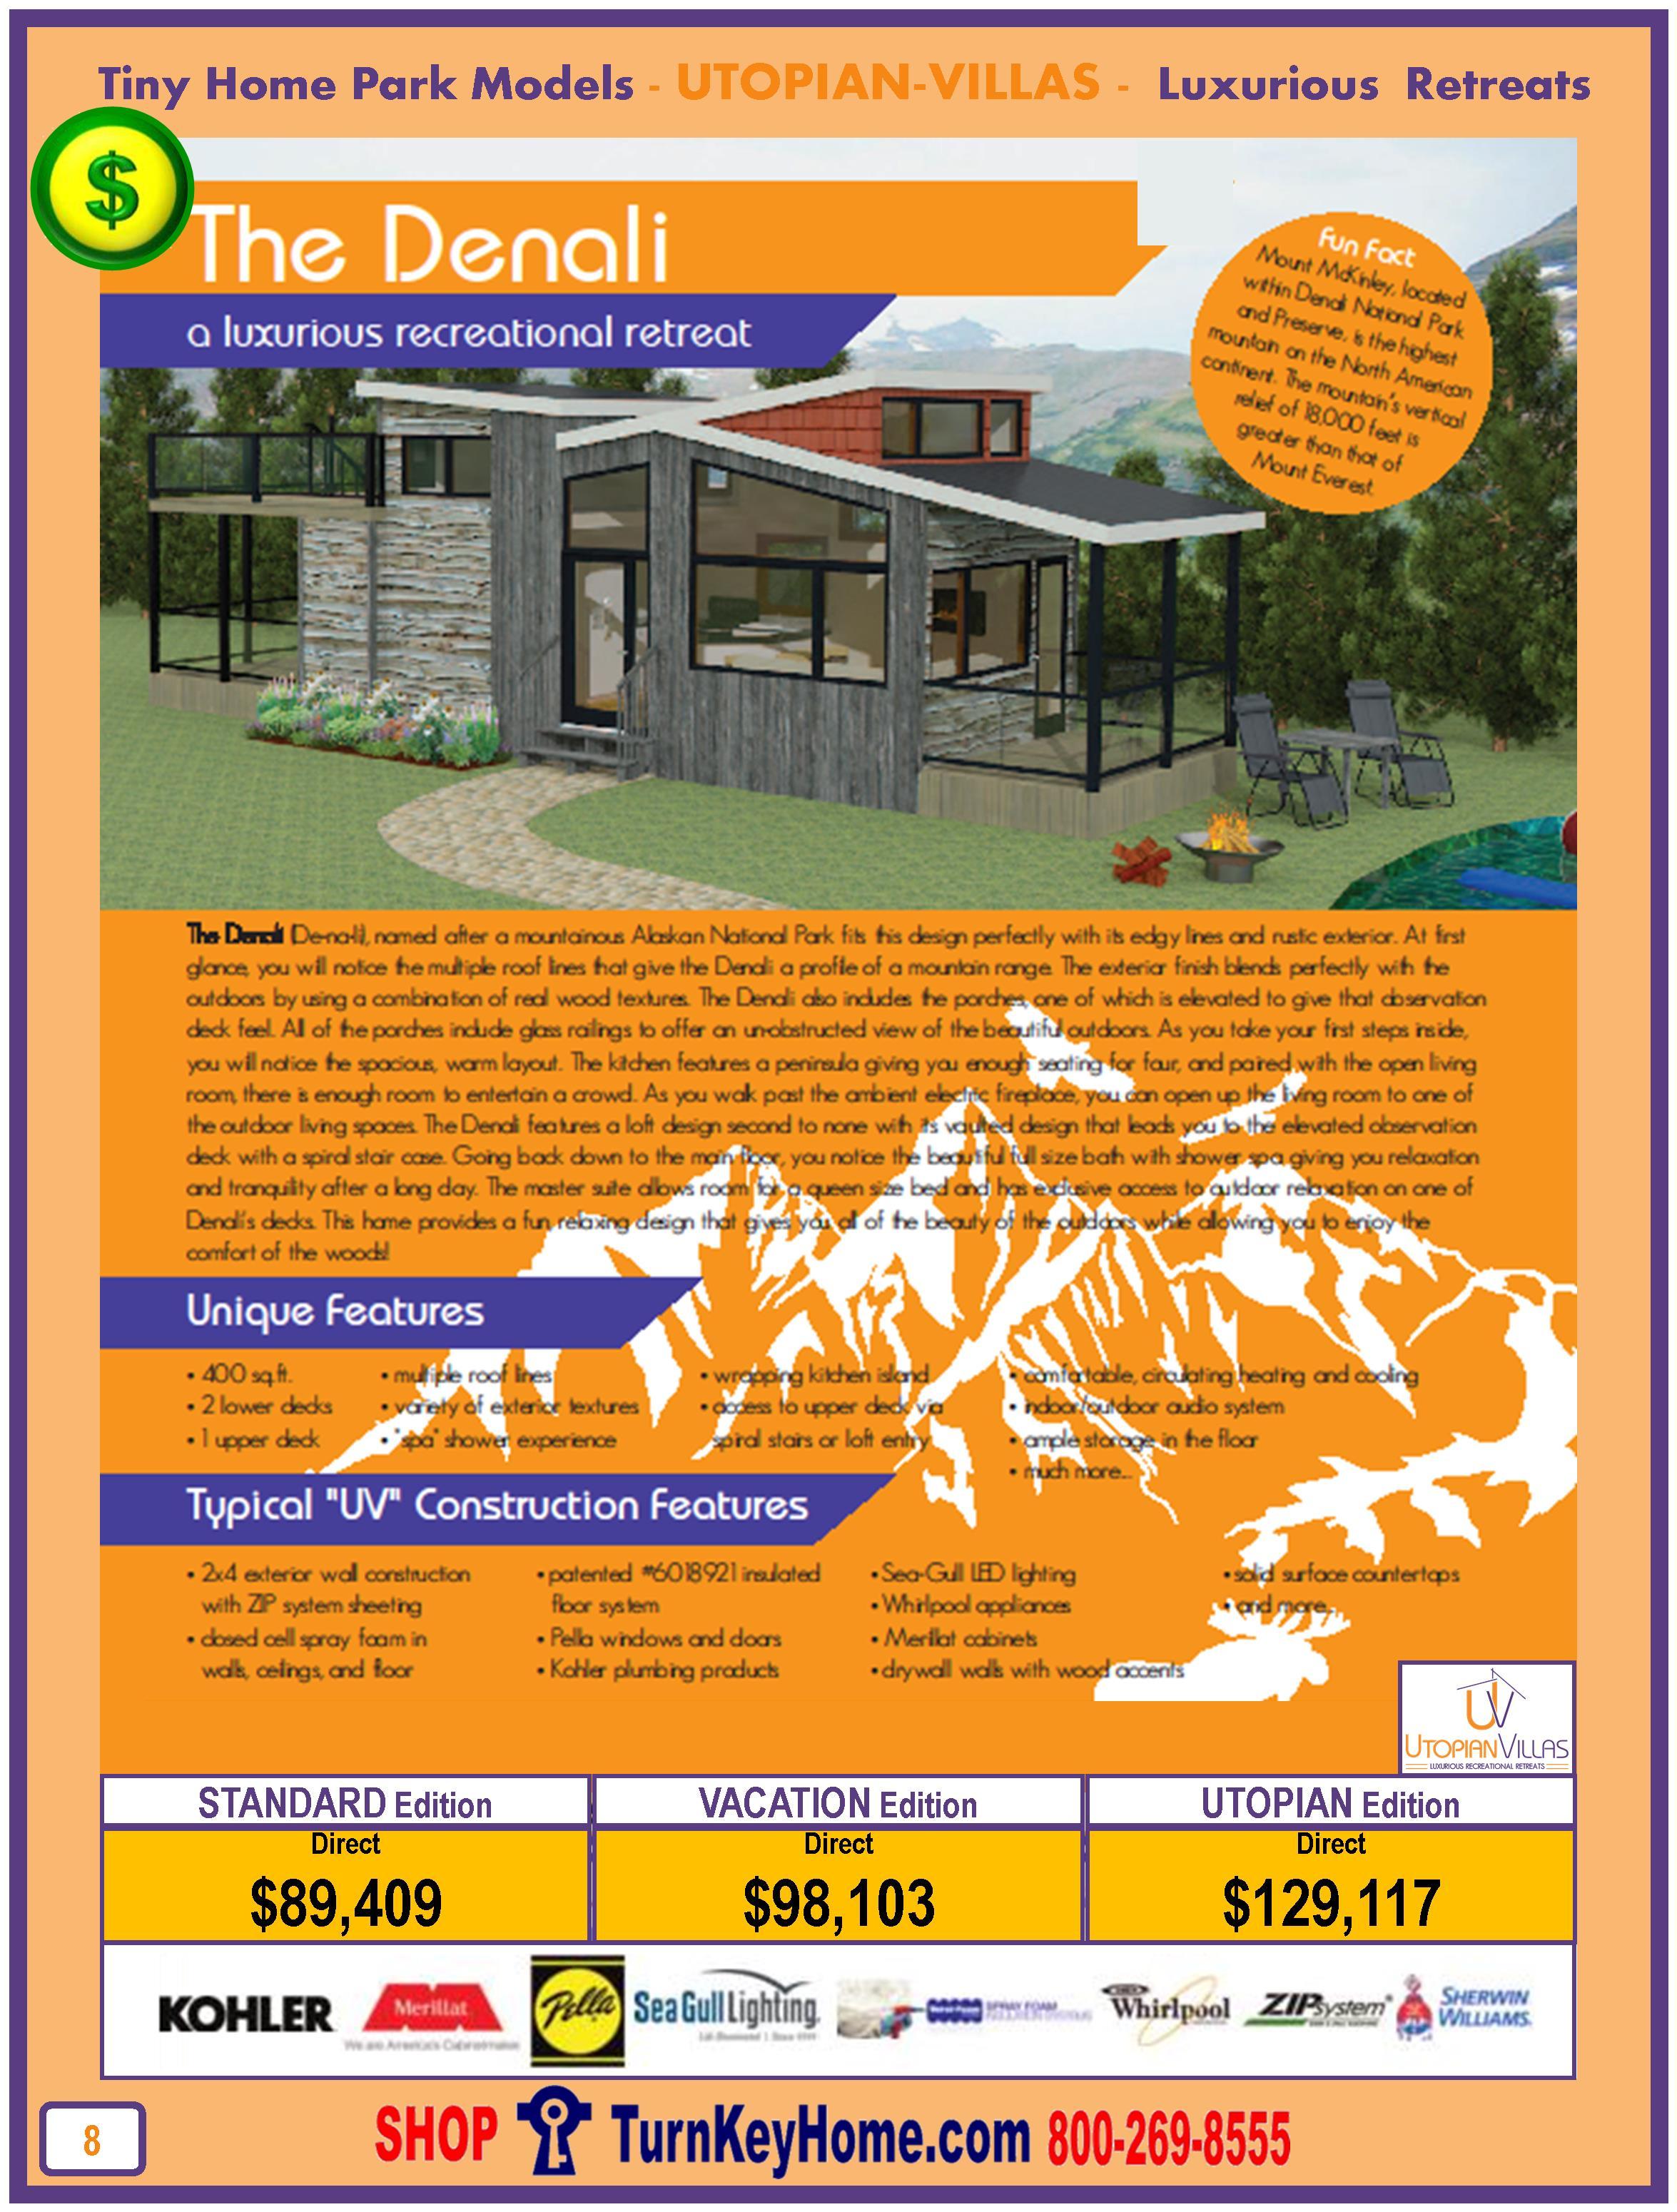 Tiny.Home.Park.Model.Utopian.Villas.DENALI.Plan.Price.P8.0116